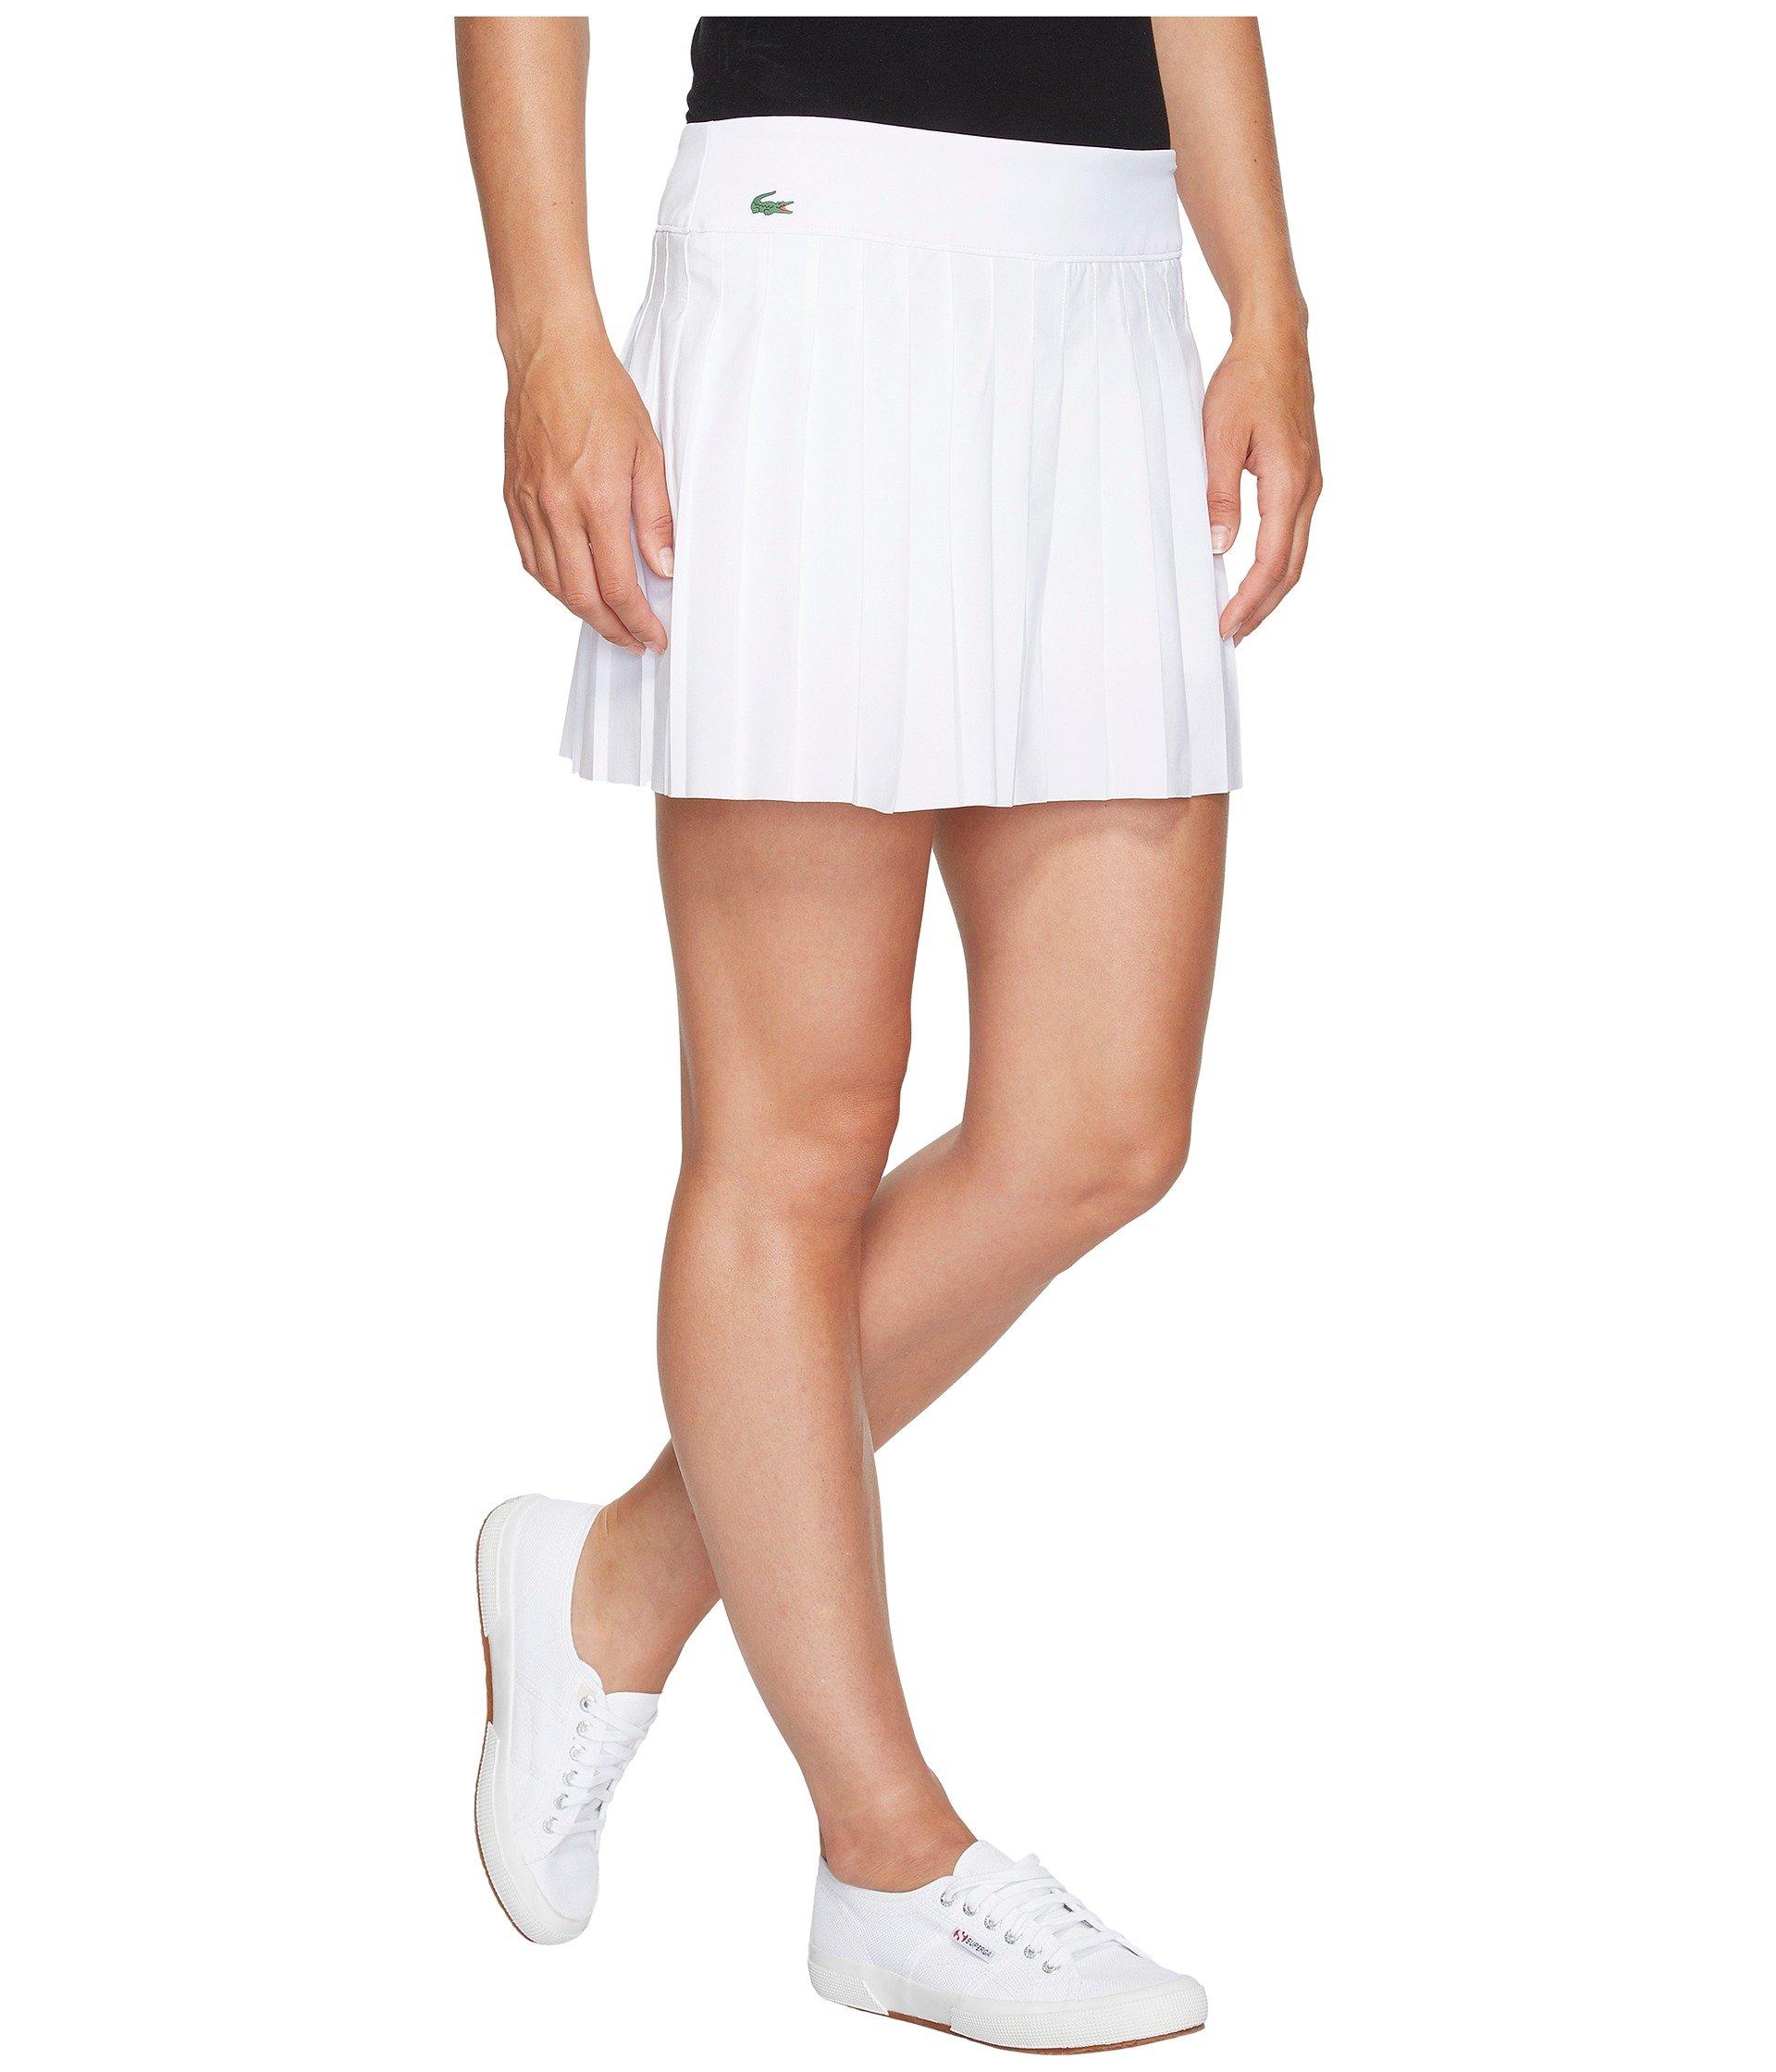 Lacoste Light Technical Woven Pleated Skirt